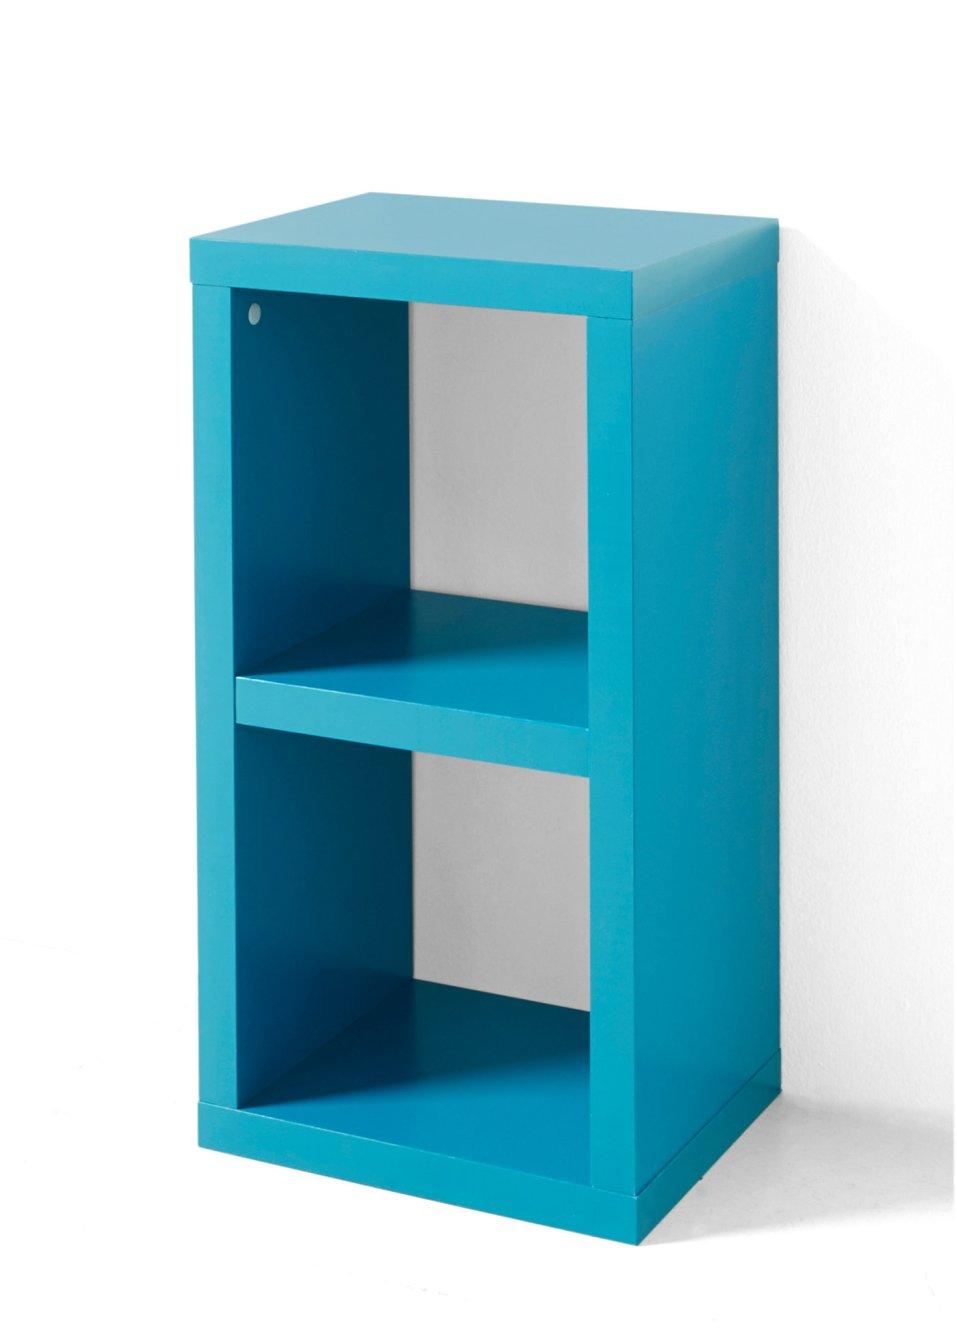 allesk nner in w rfelform regal kenia 2 f cher t rkis mit 2 f chern. Black Bedroom Furniture Sets. Home Design Ideas